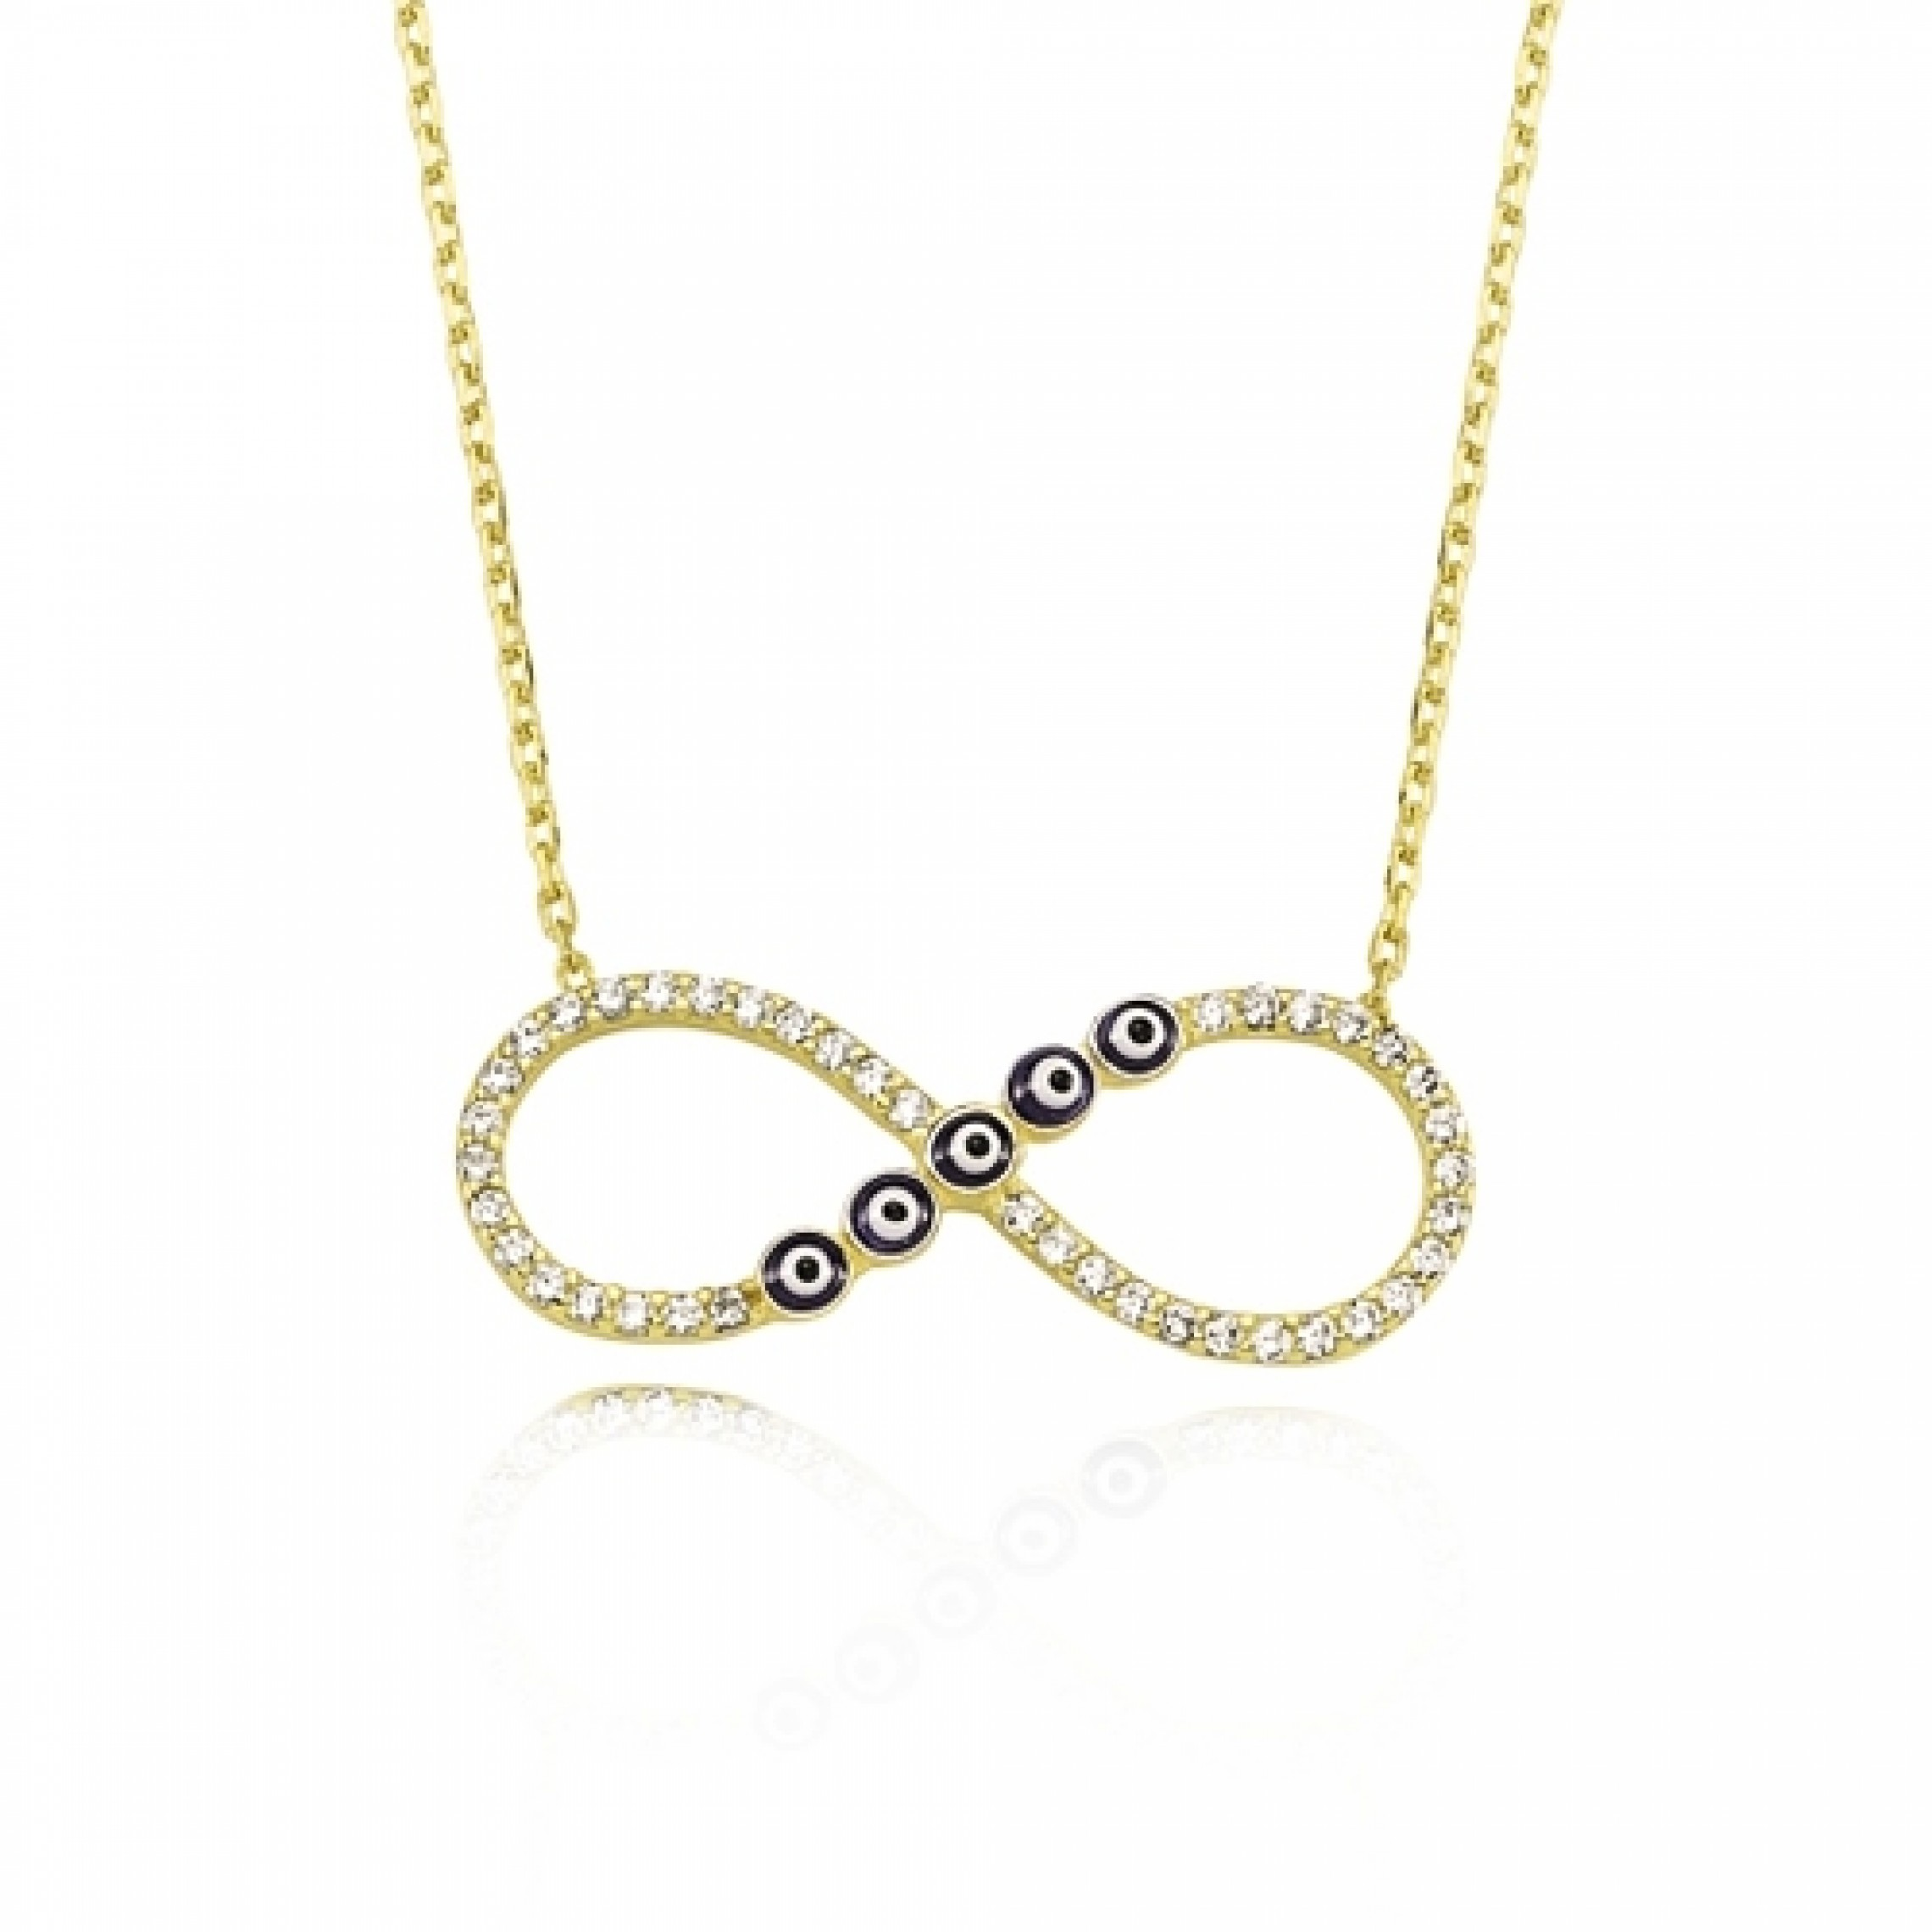 JN-190071 Evil Eye 925 Sterling Silver CZ Necklace Infinity Eyes